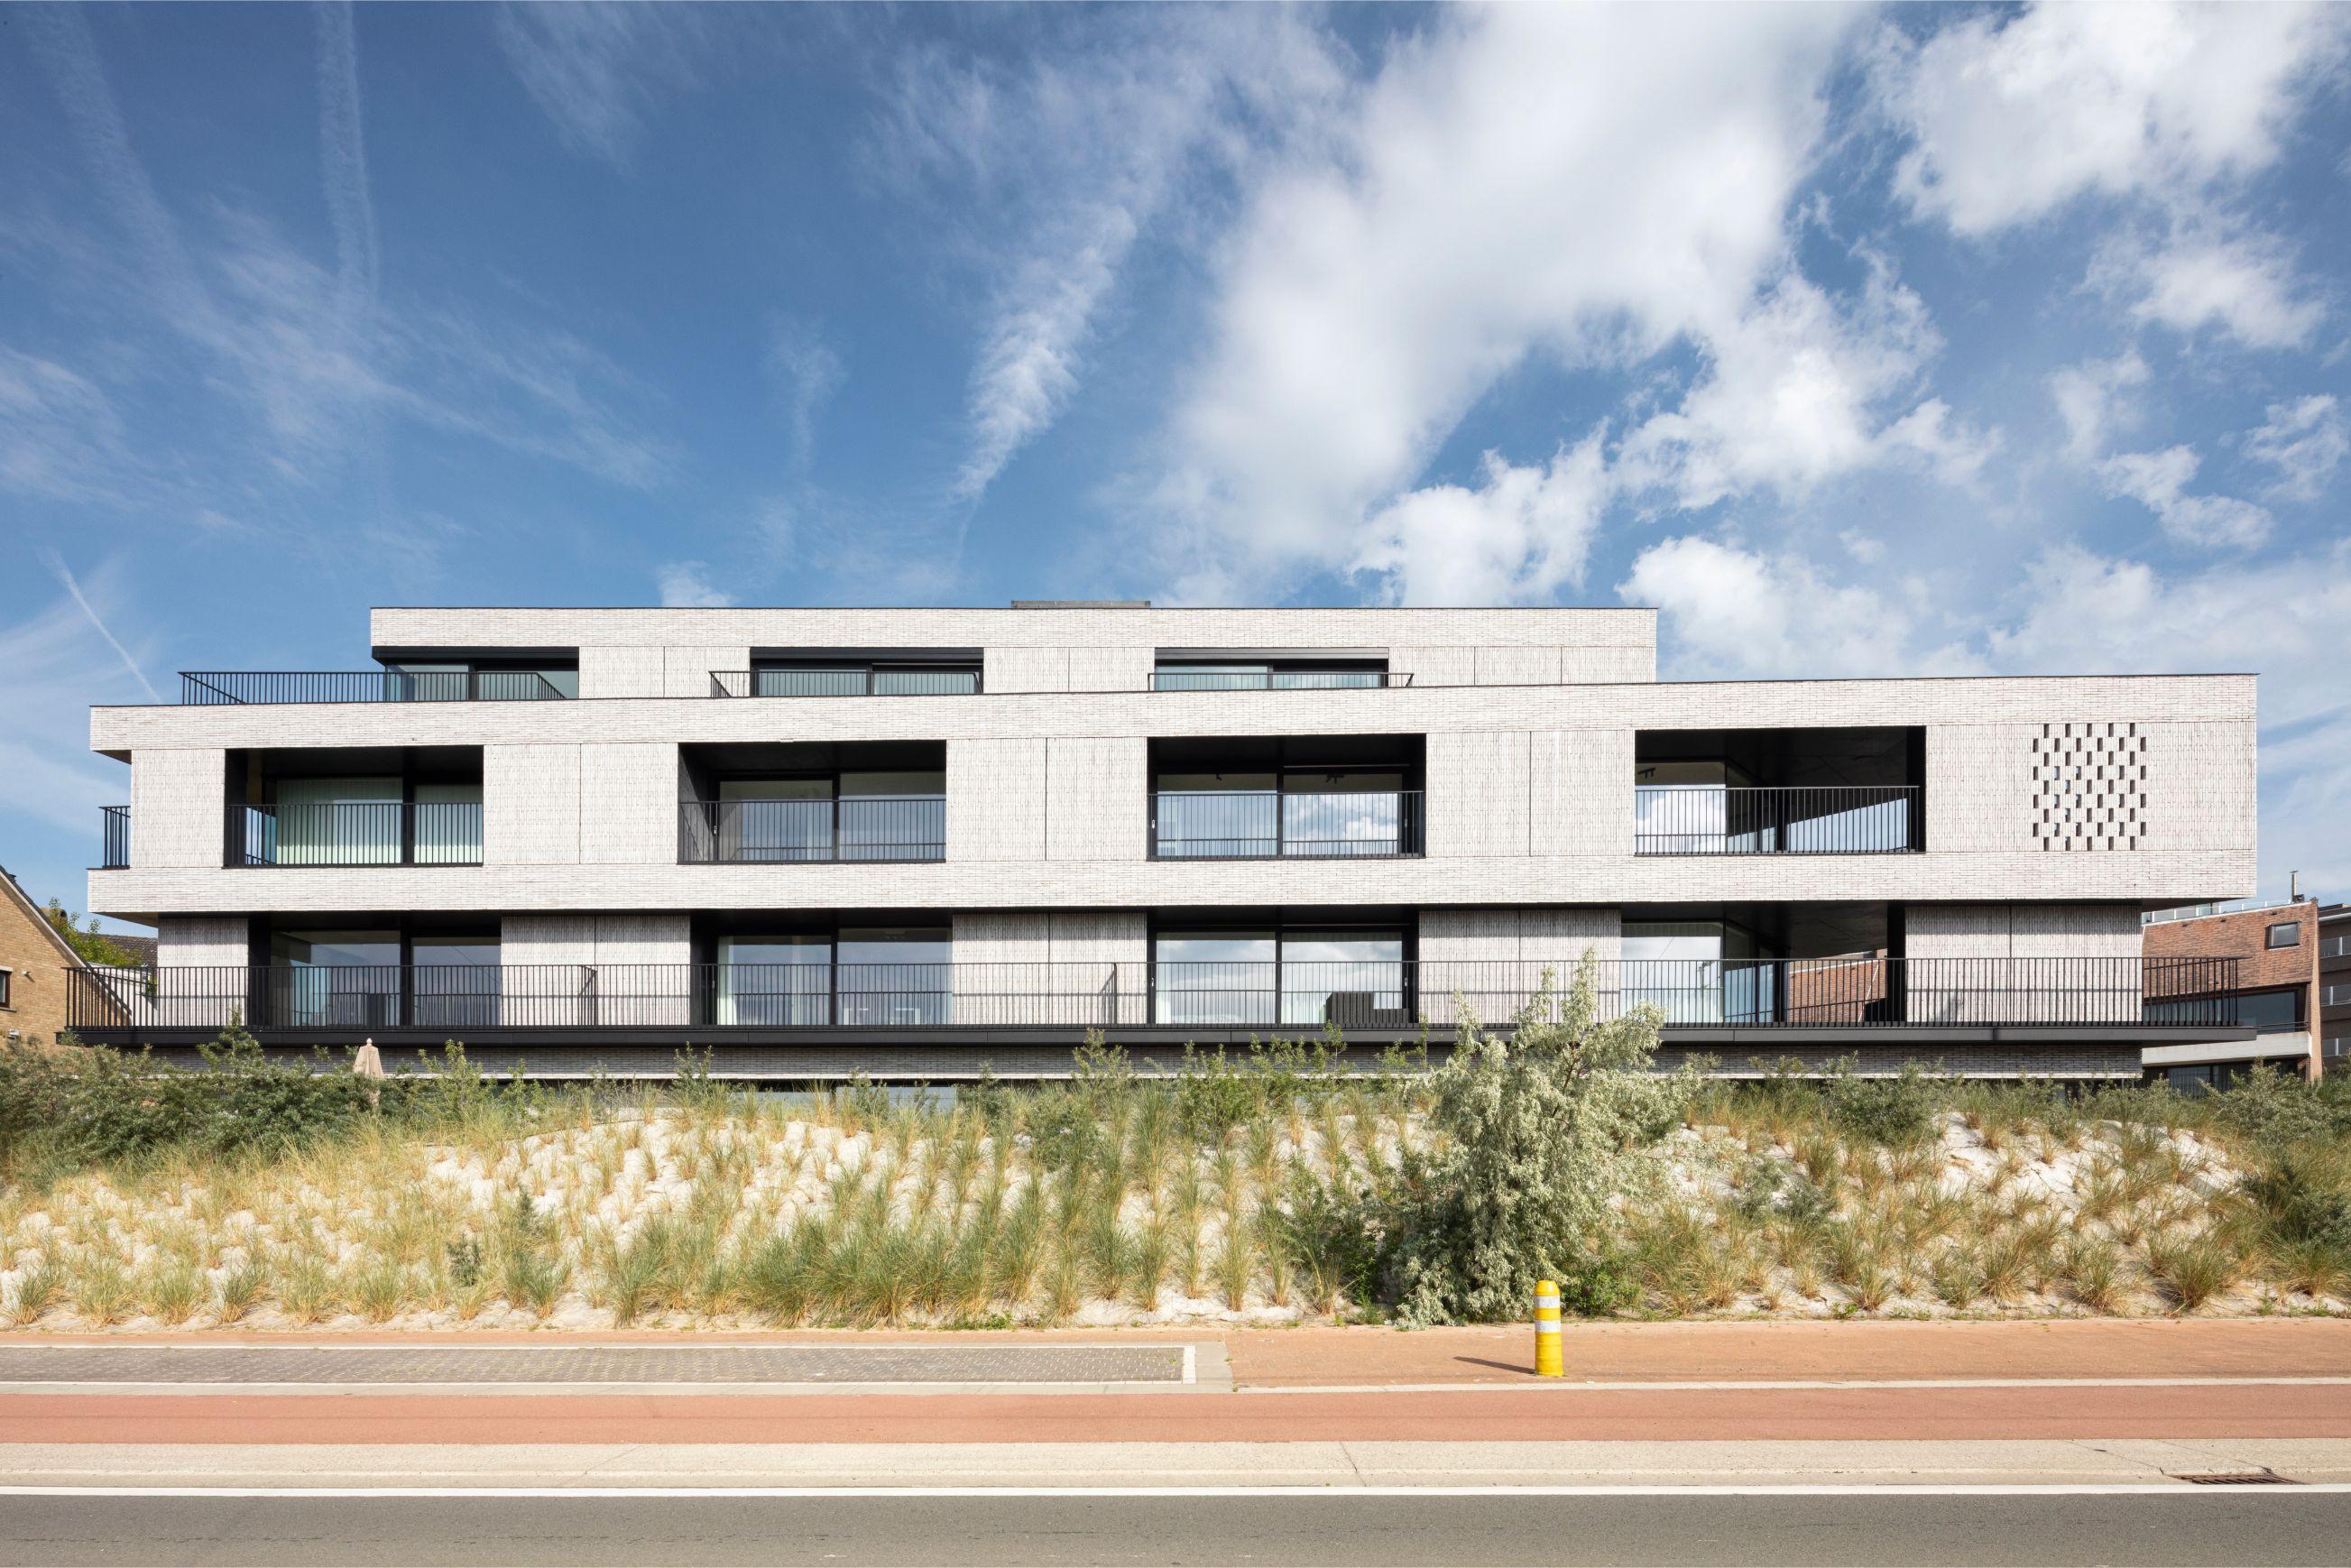 Pierre Paulin - Rietveldprojects - Sint-Idesbald - Tvdv11